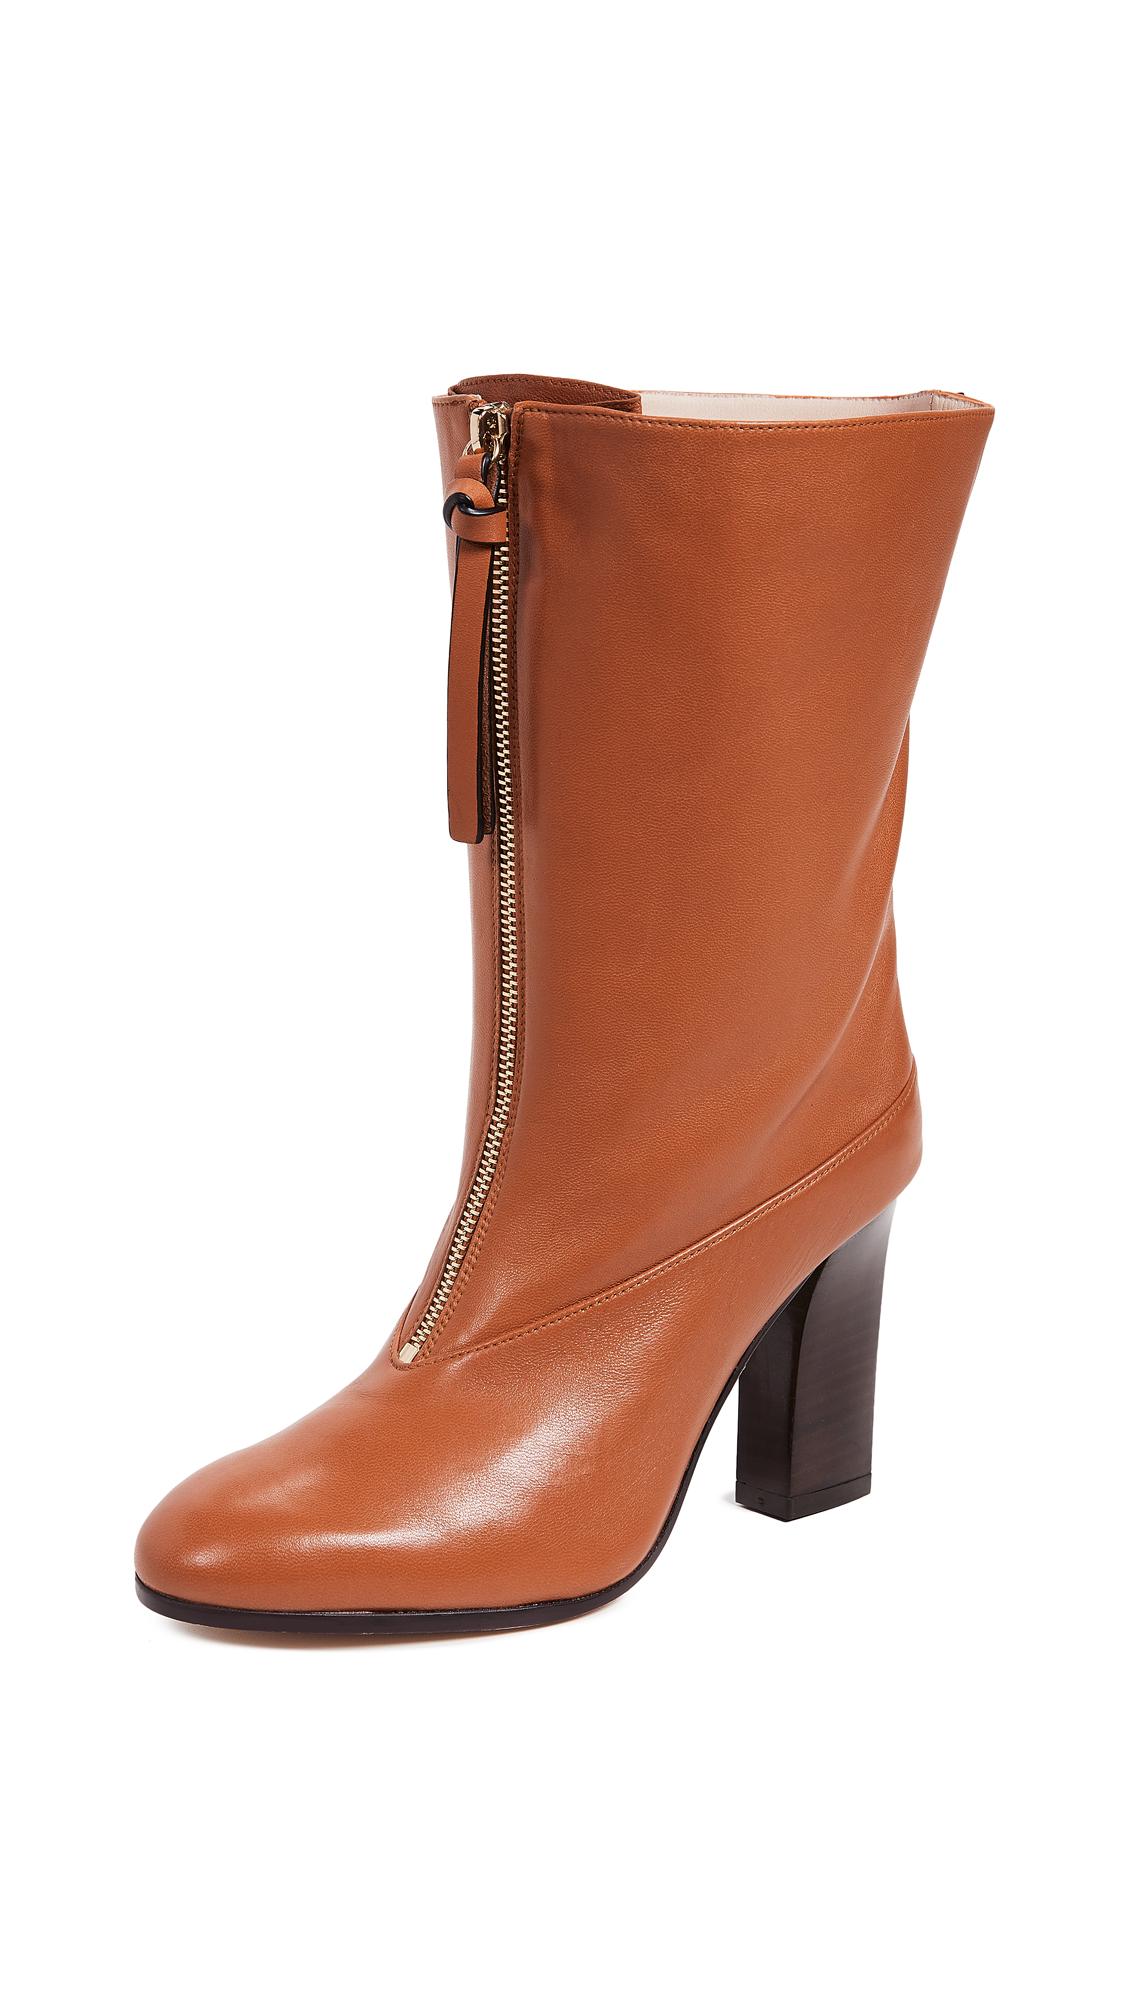 Stuart Weitzman Jett Boots - Bridle